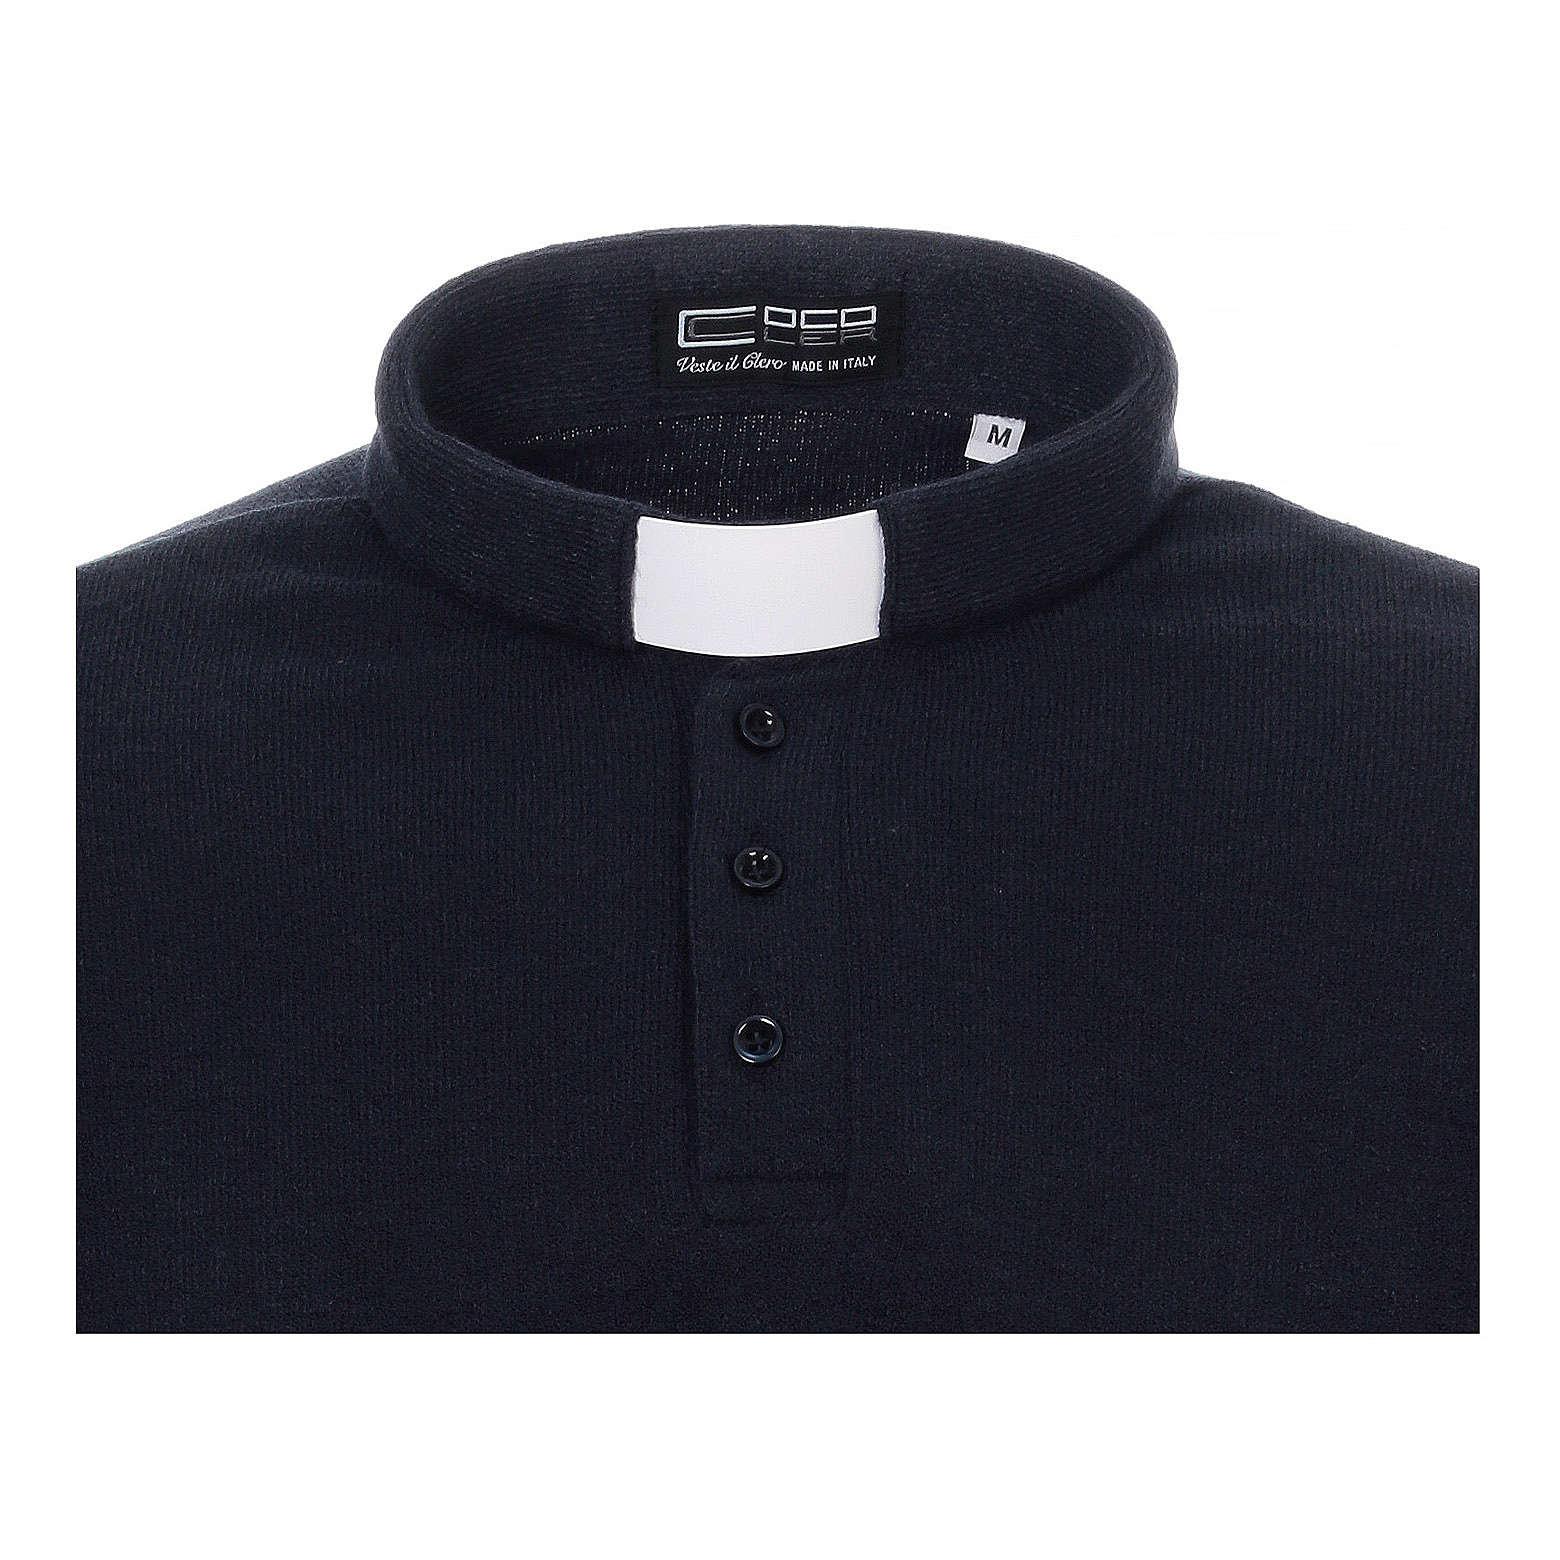 Polo clergy manches longues bleu tissu mixte laine 4